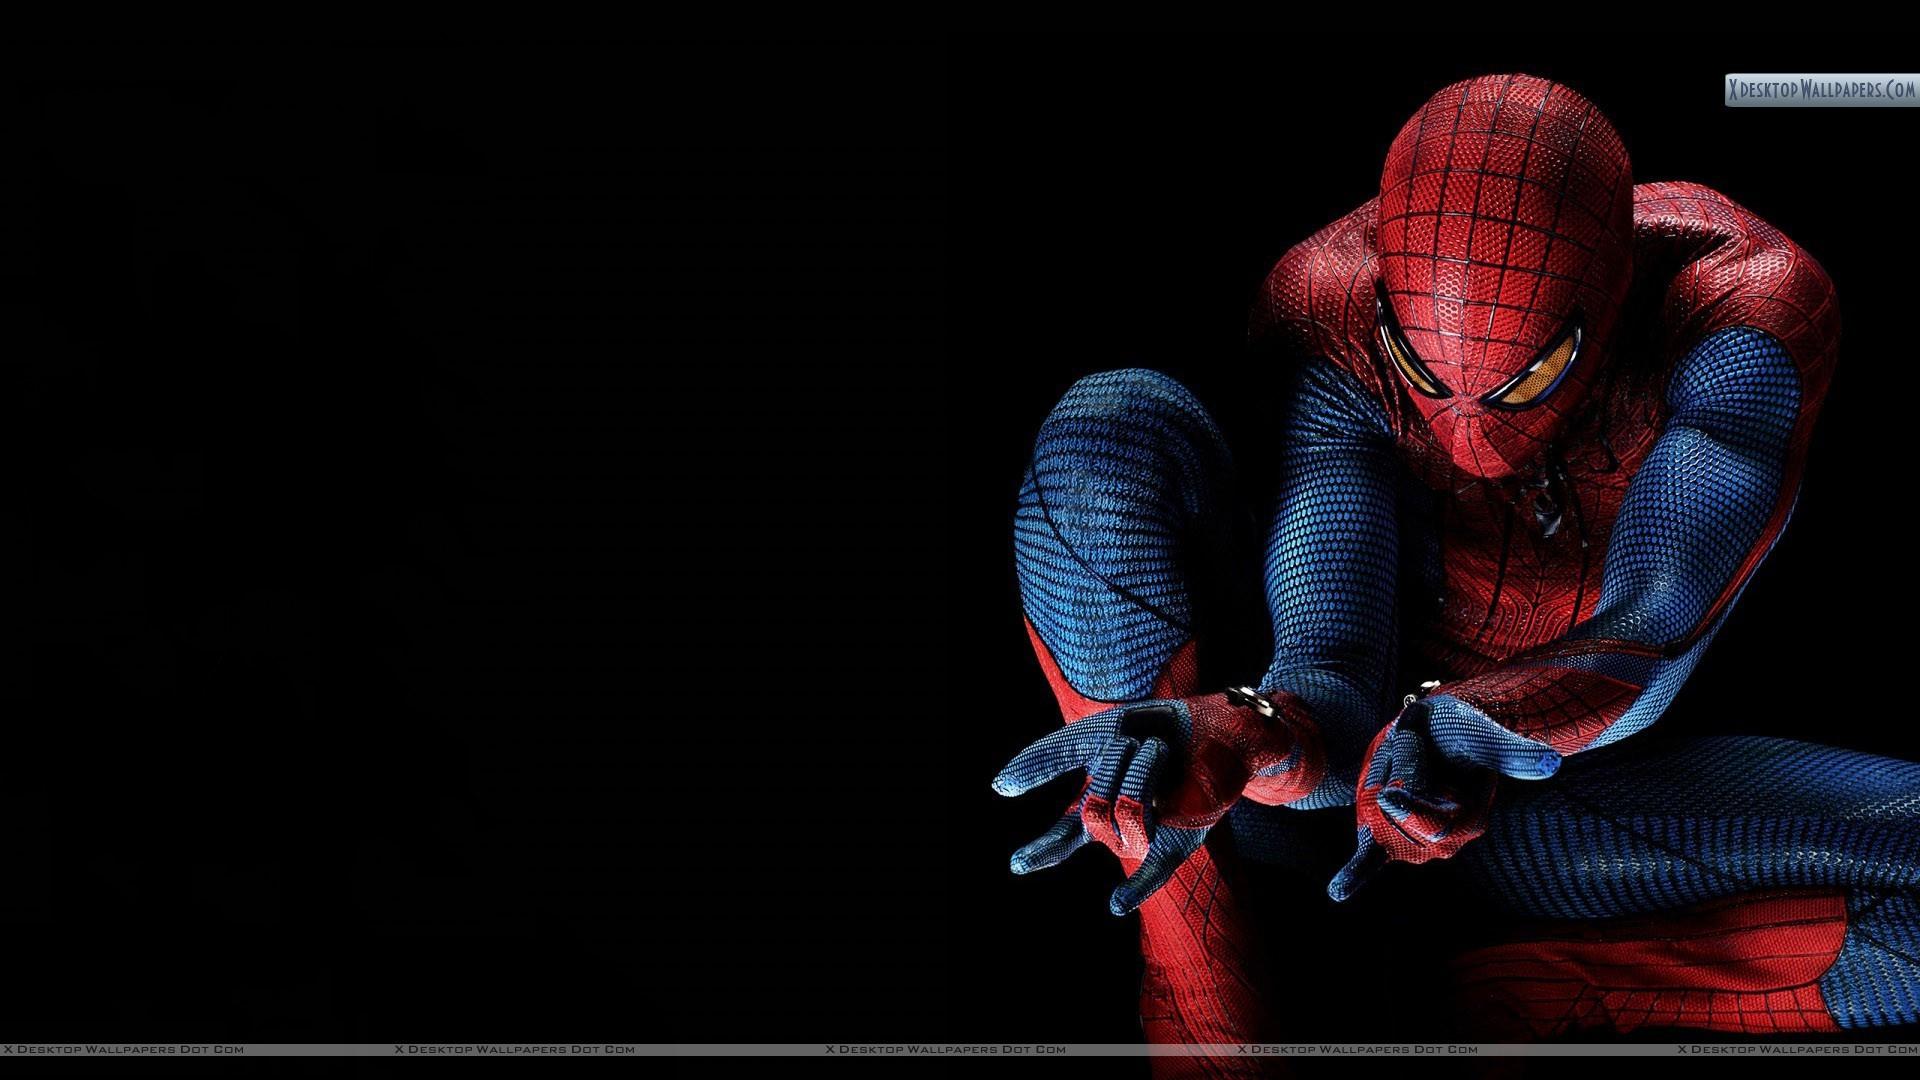 mostbeautifuldesktopwallpaper Free Download Spiderman Wallpaper | HD  Wallpapers | Pinterest | Black spiderman and Wallpaper